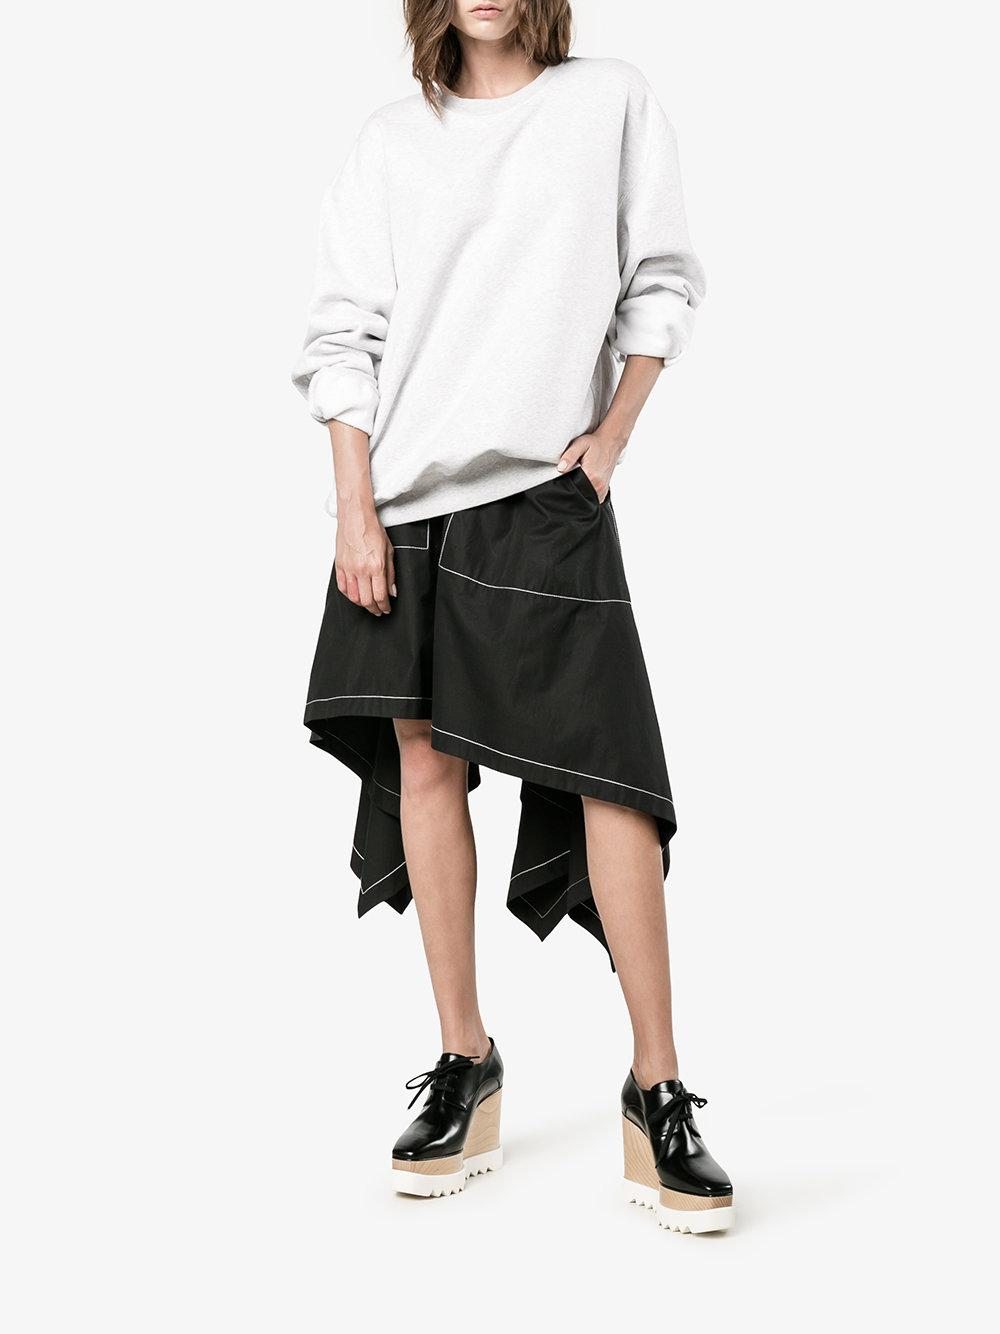 7bcdeb91d0b0 Stella McCartney Elyse Platform Shoes in Black - Lyst